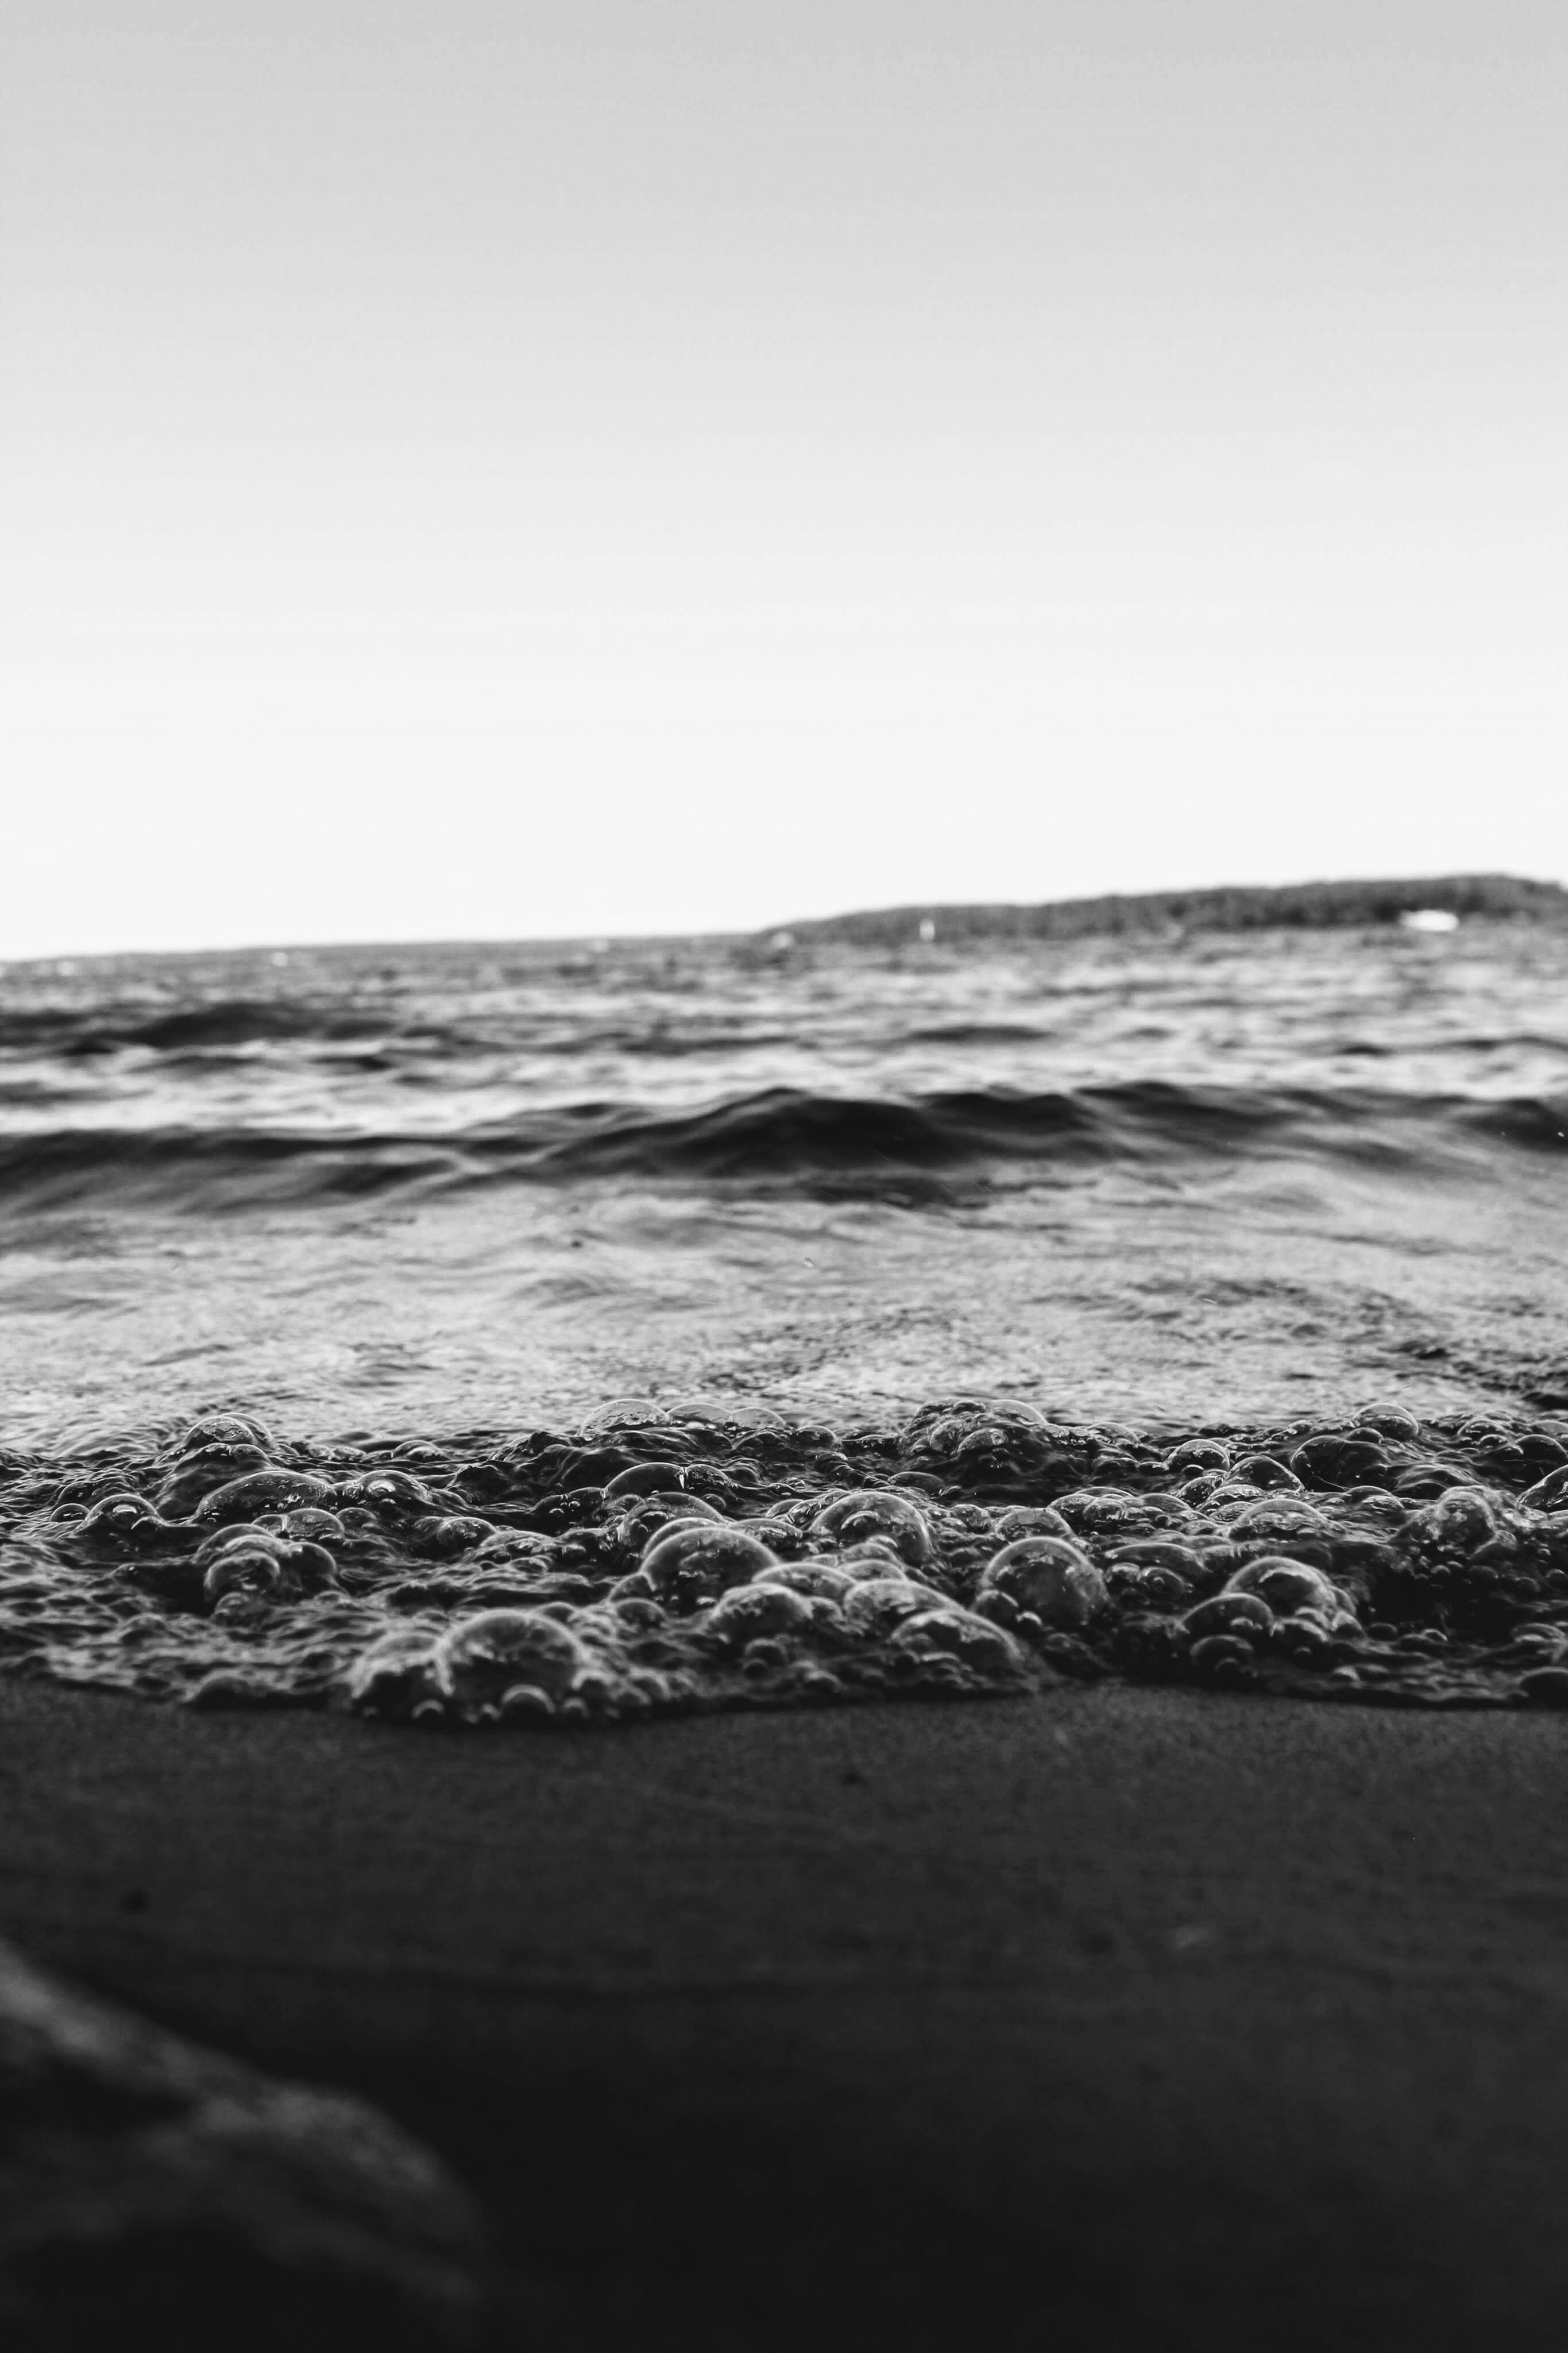 seashore in closeup photography